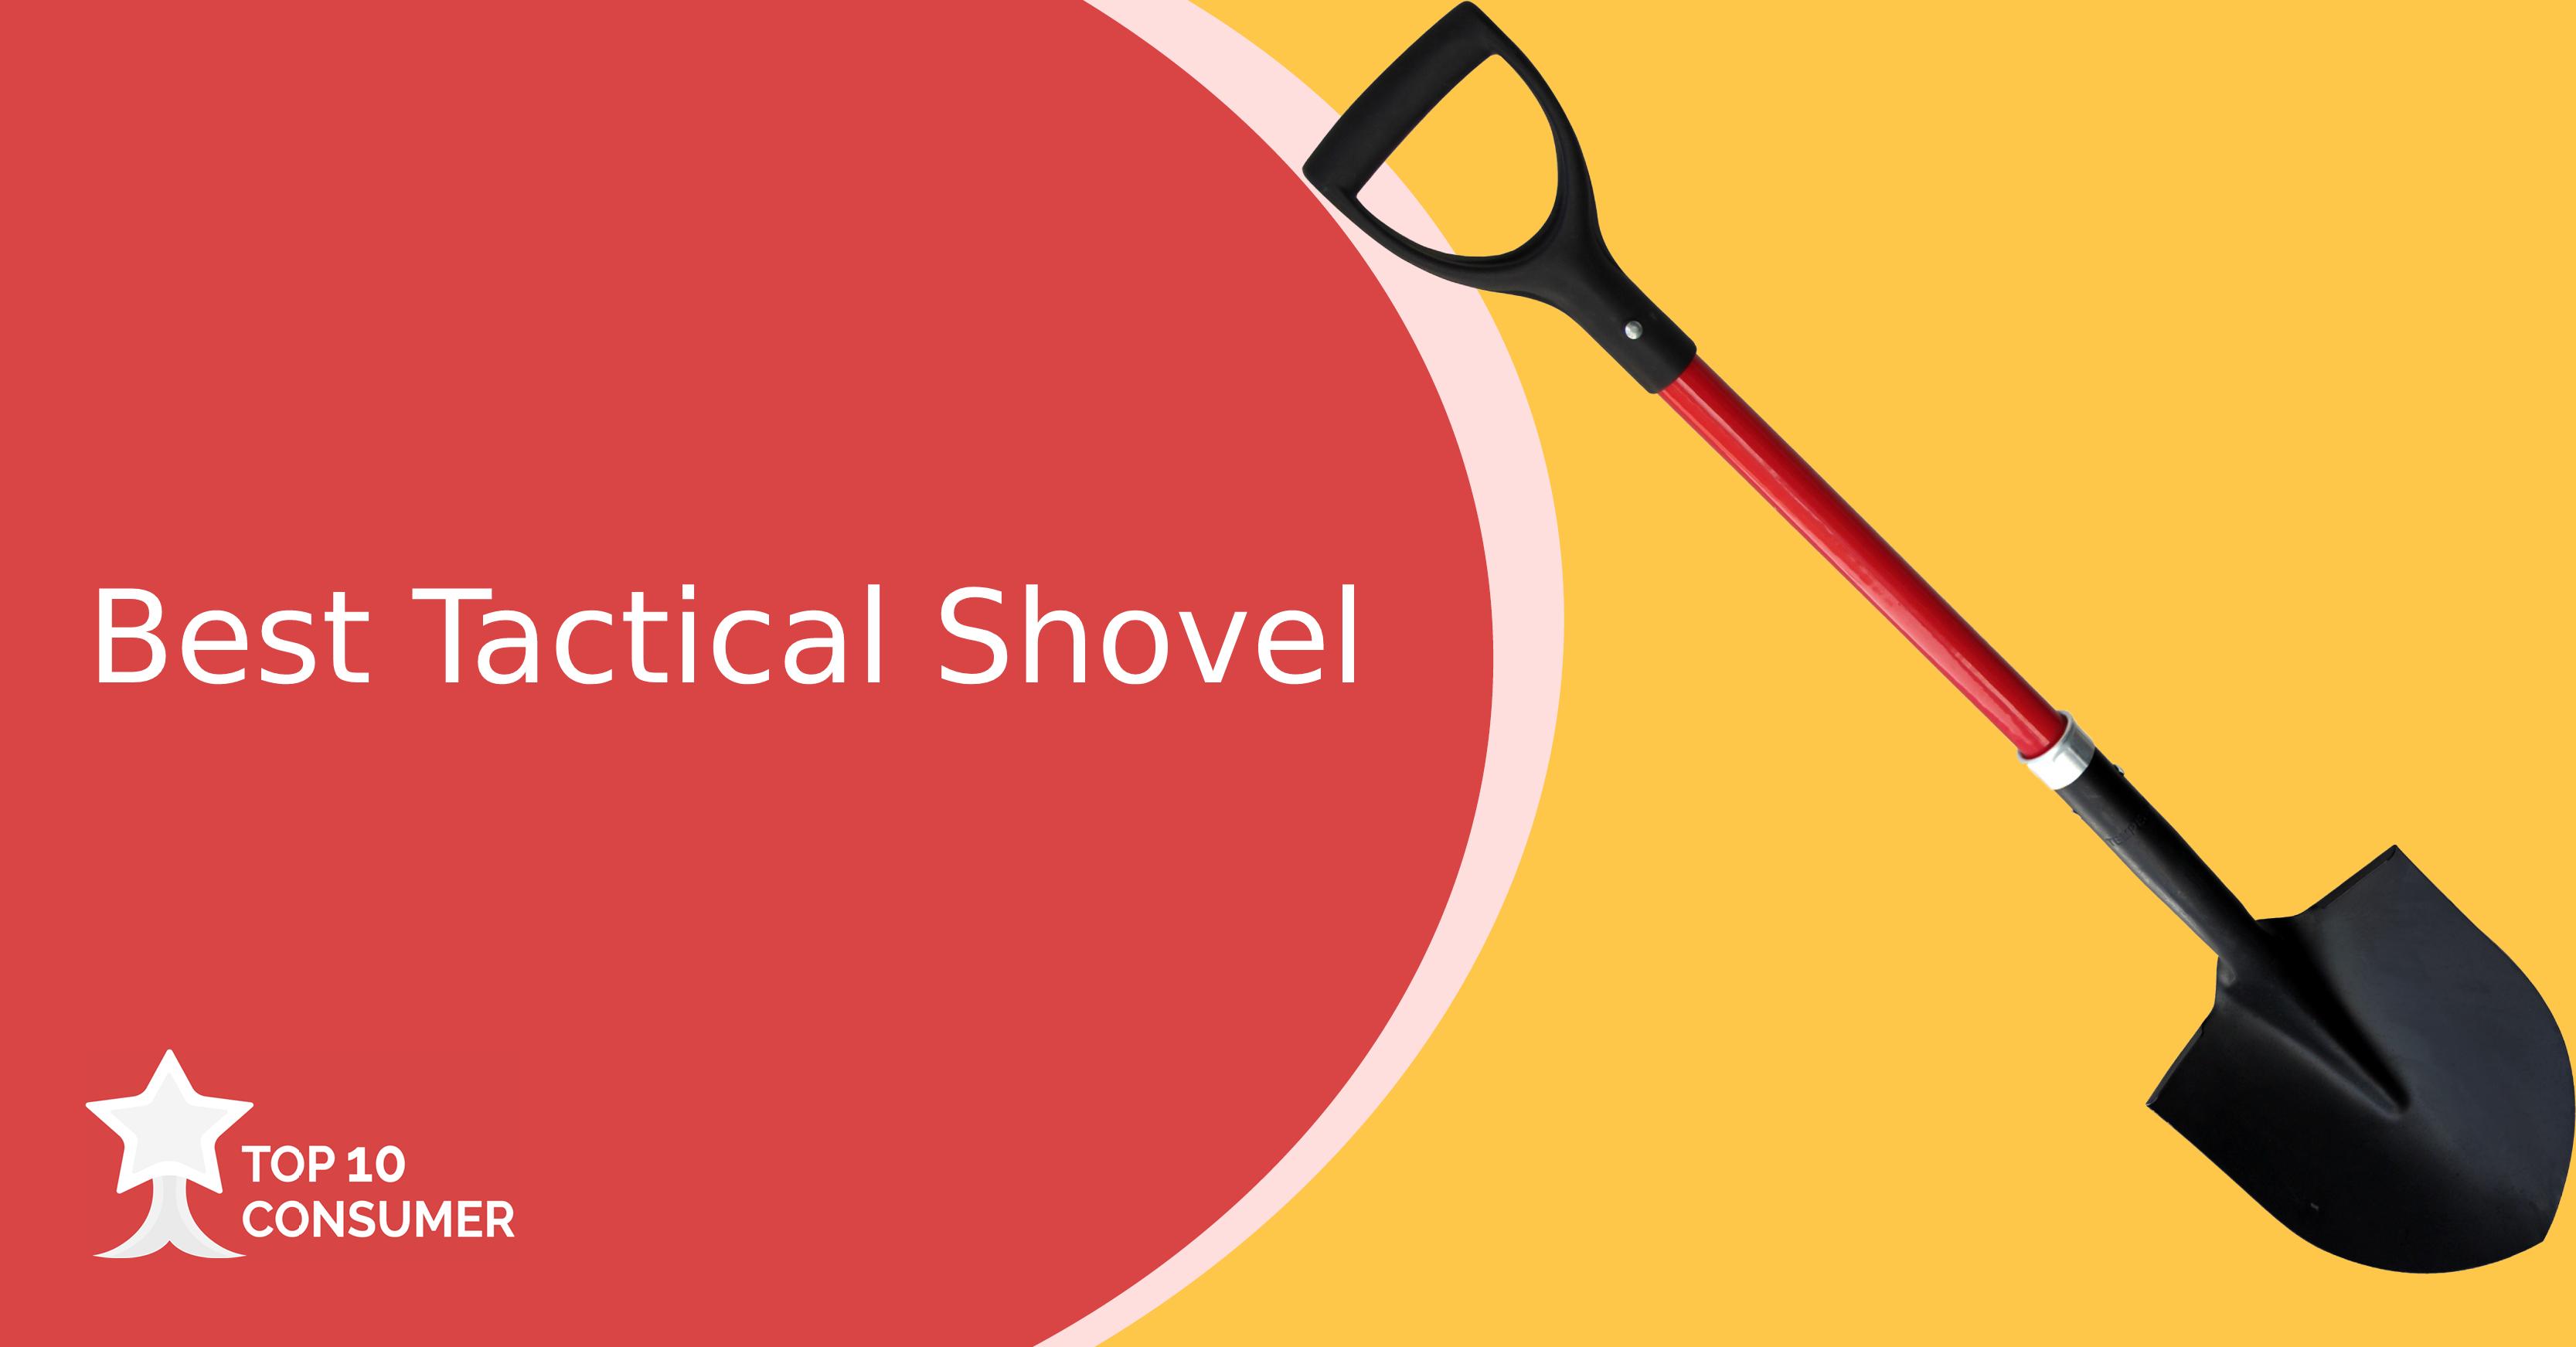 Best Tactical Shovel